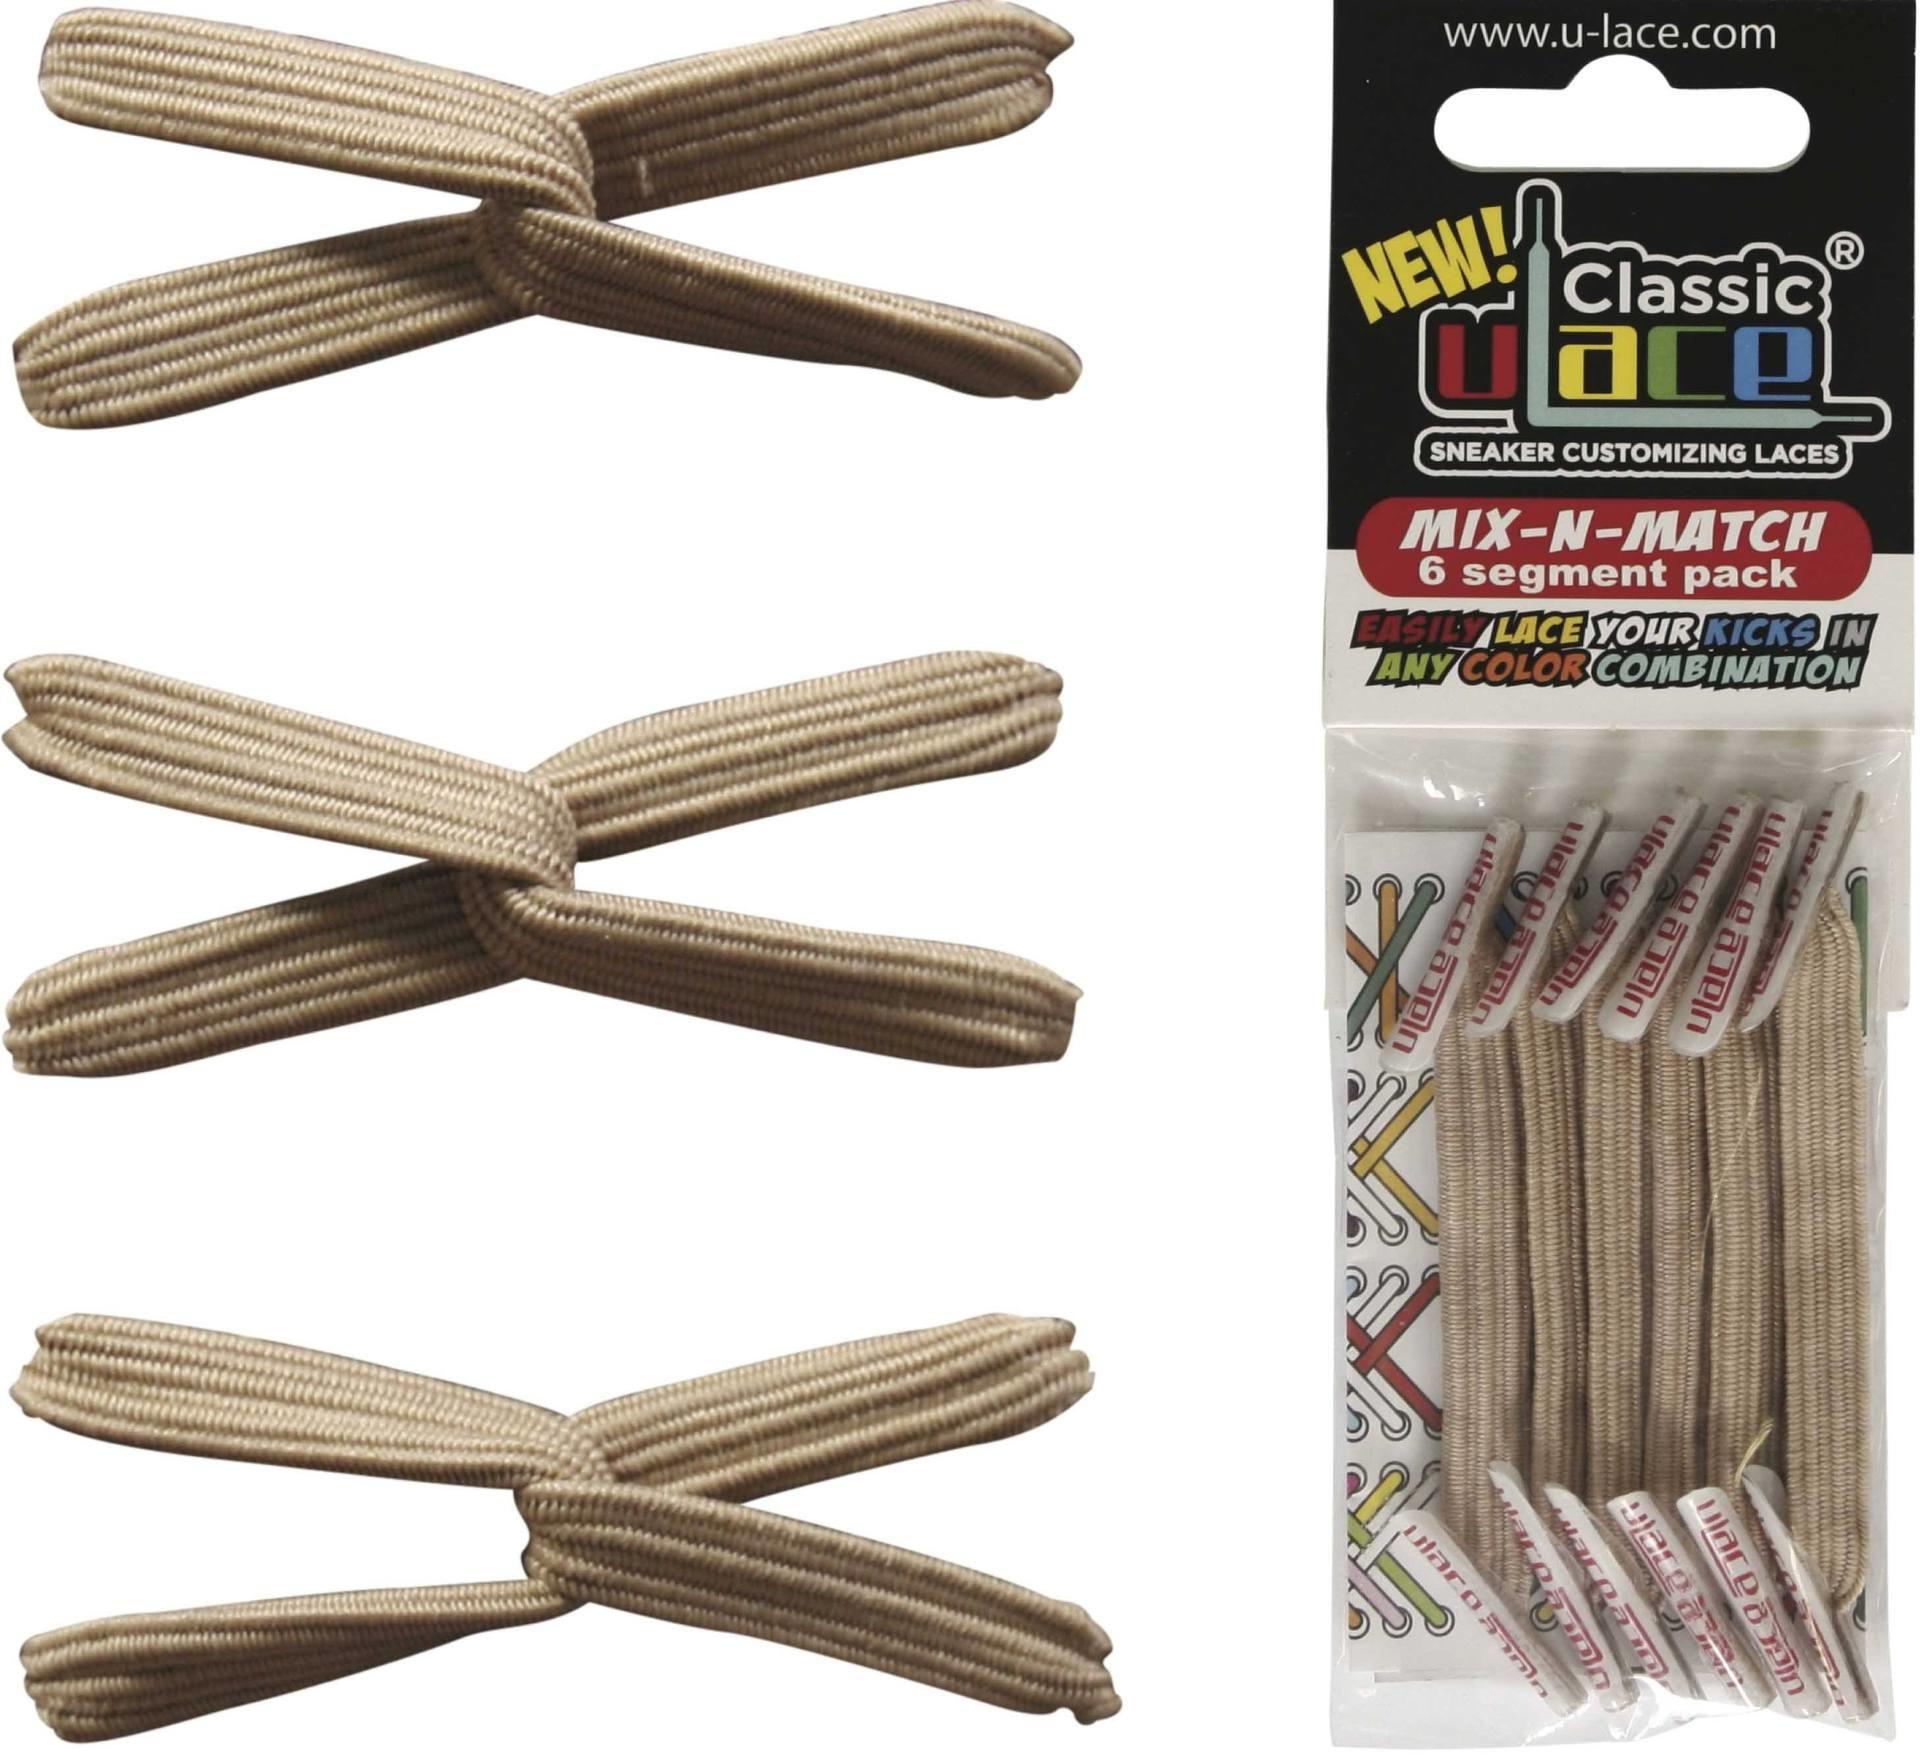 U-LACE VETERS U-Lace veters Mix-n-Match Khaki